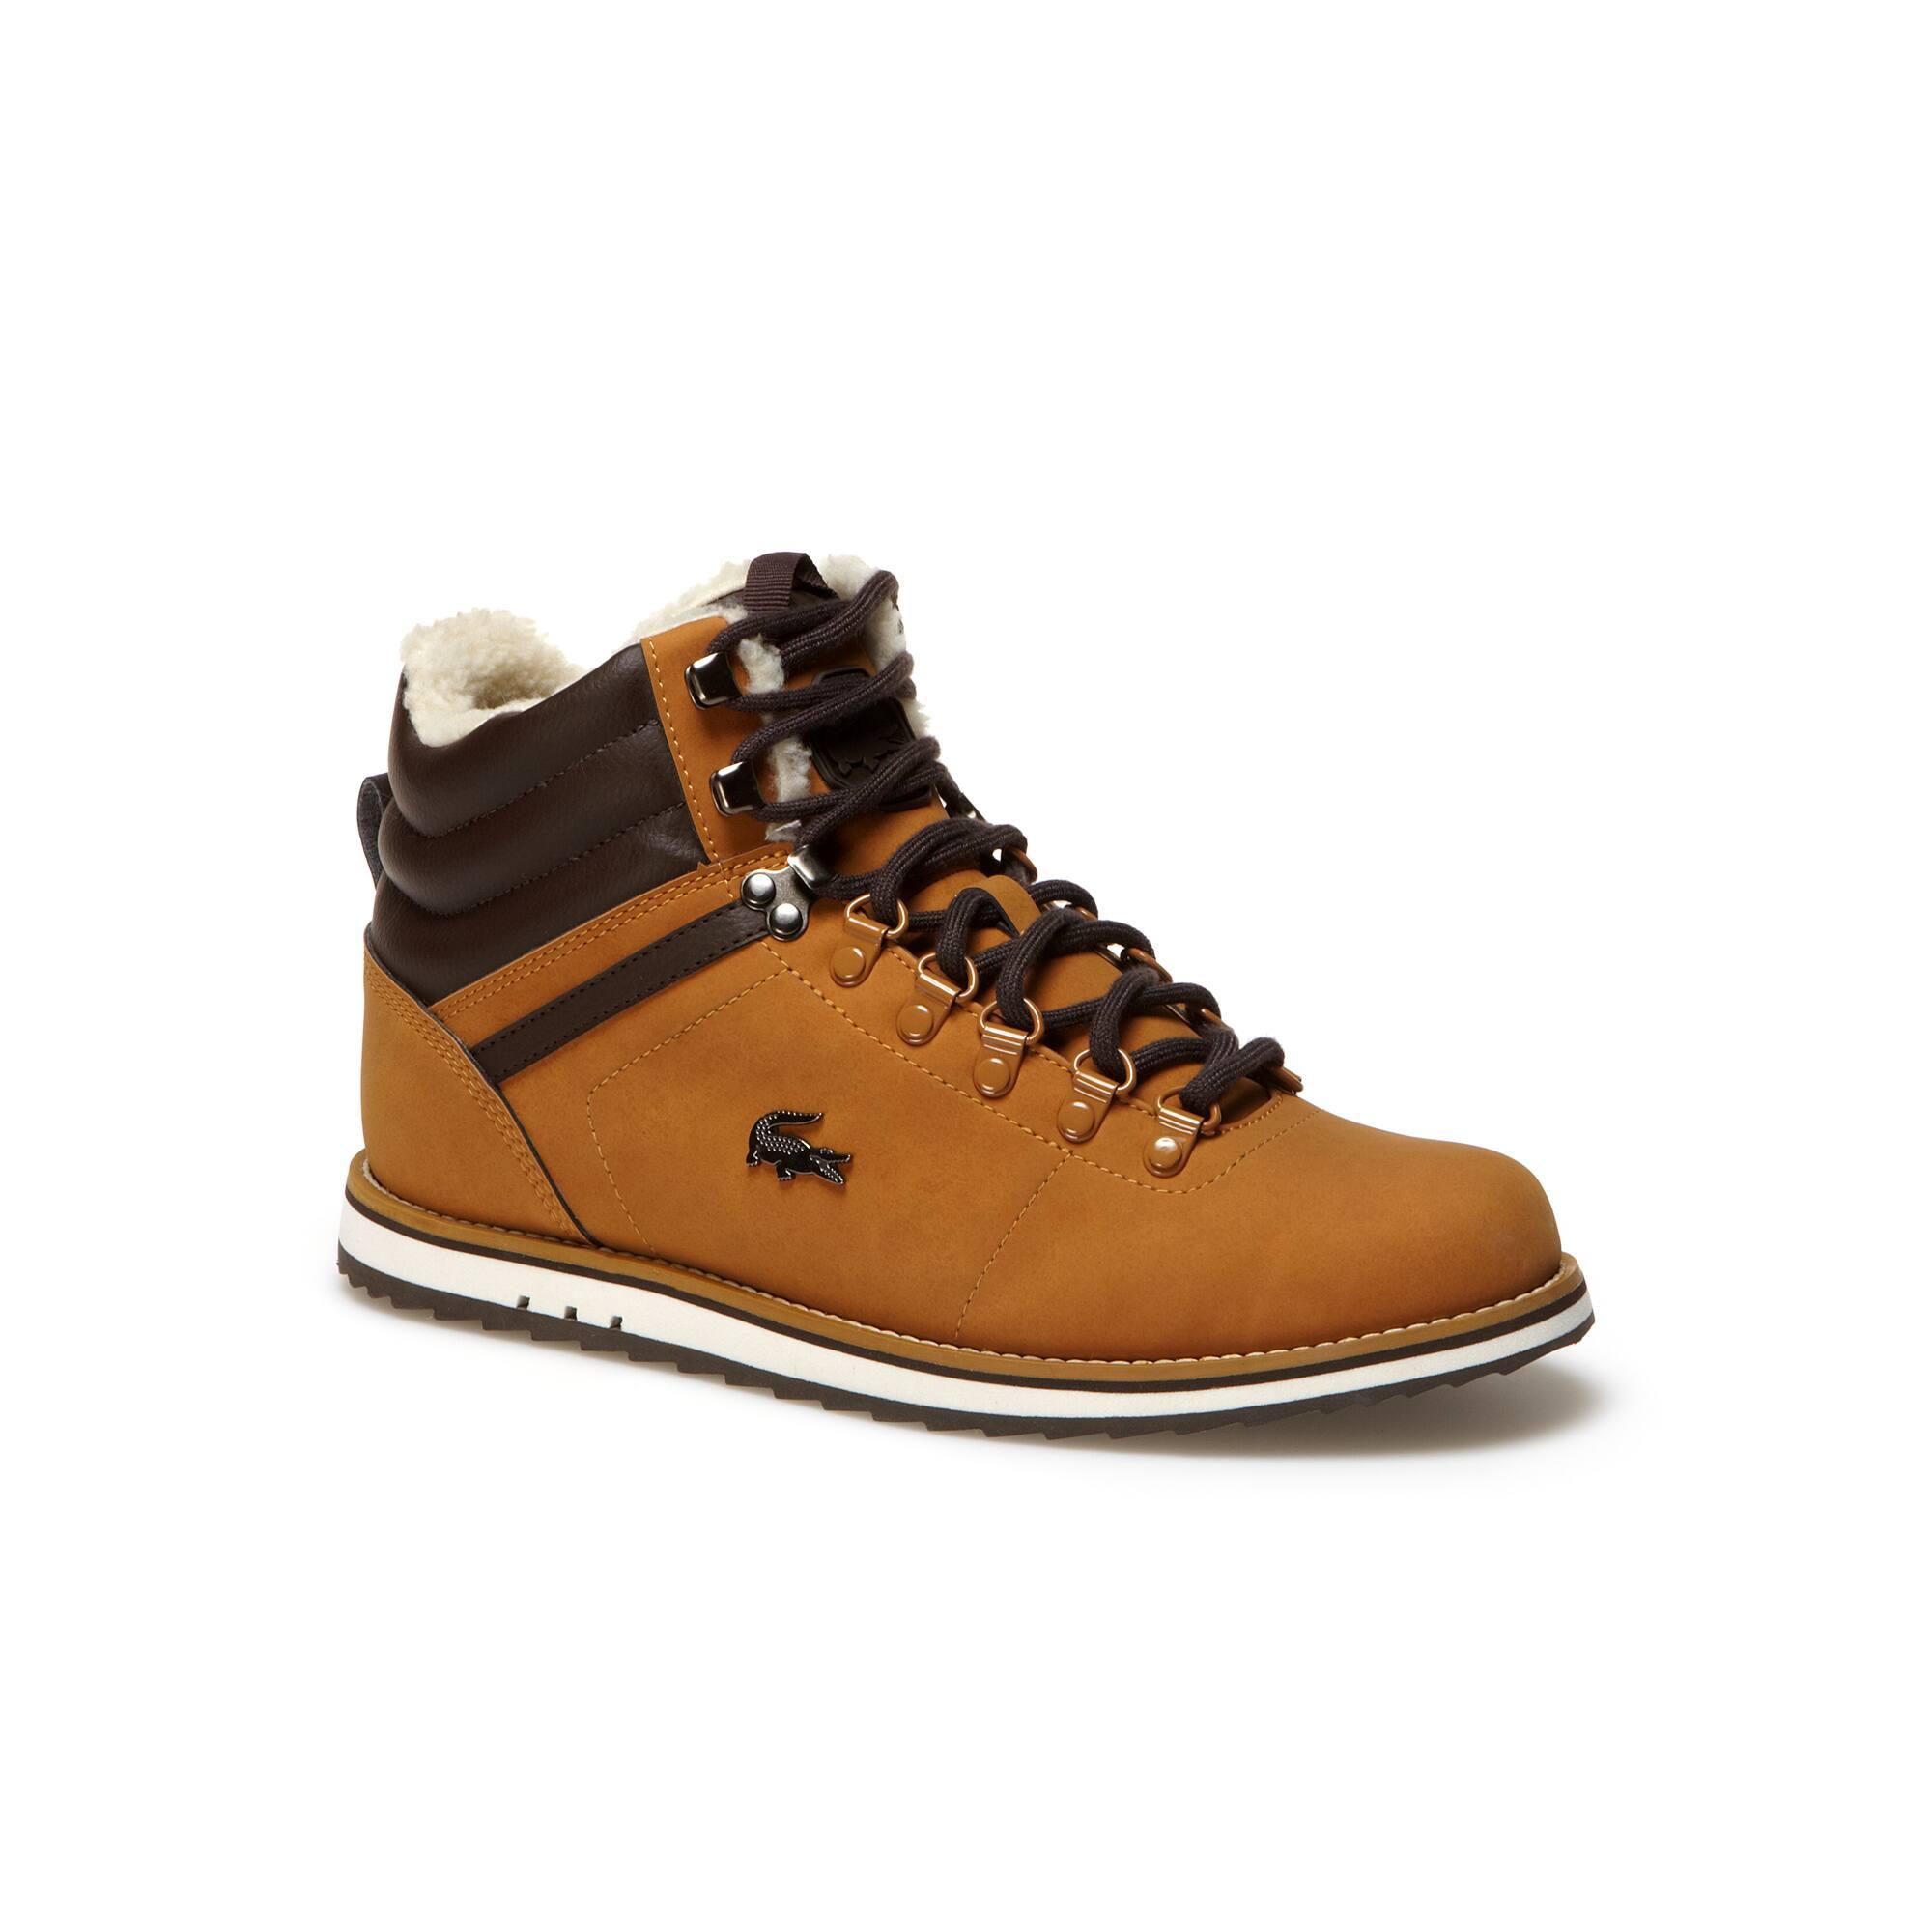 Jarmund Put 2 two-tone high-top boots